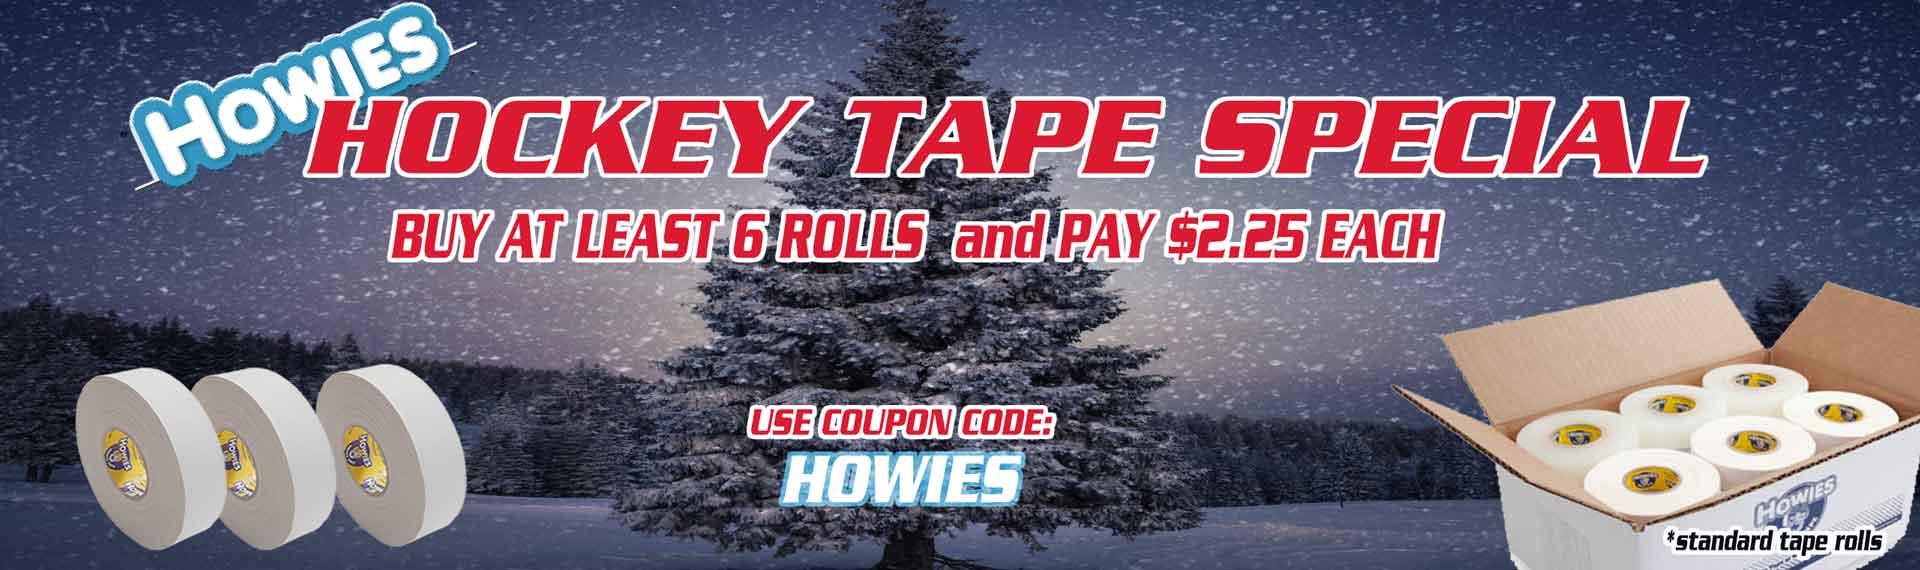 Hockey Plus Ice hockey tape howies coupon code